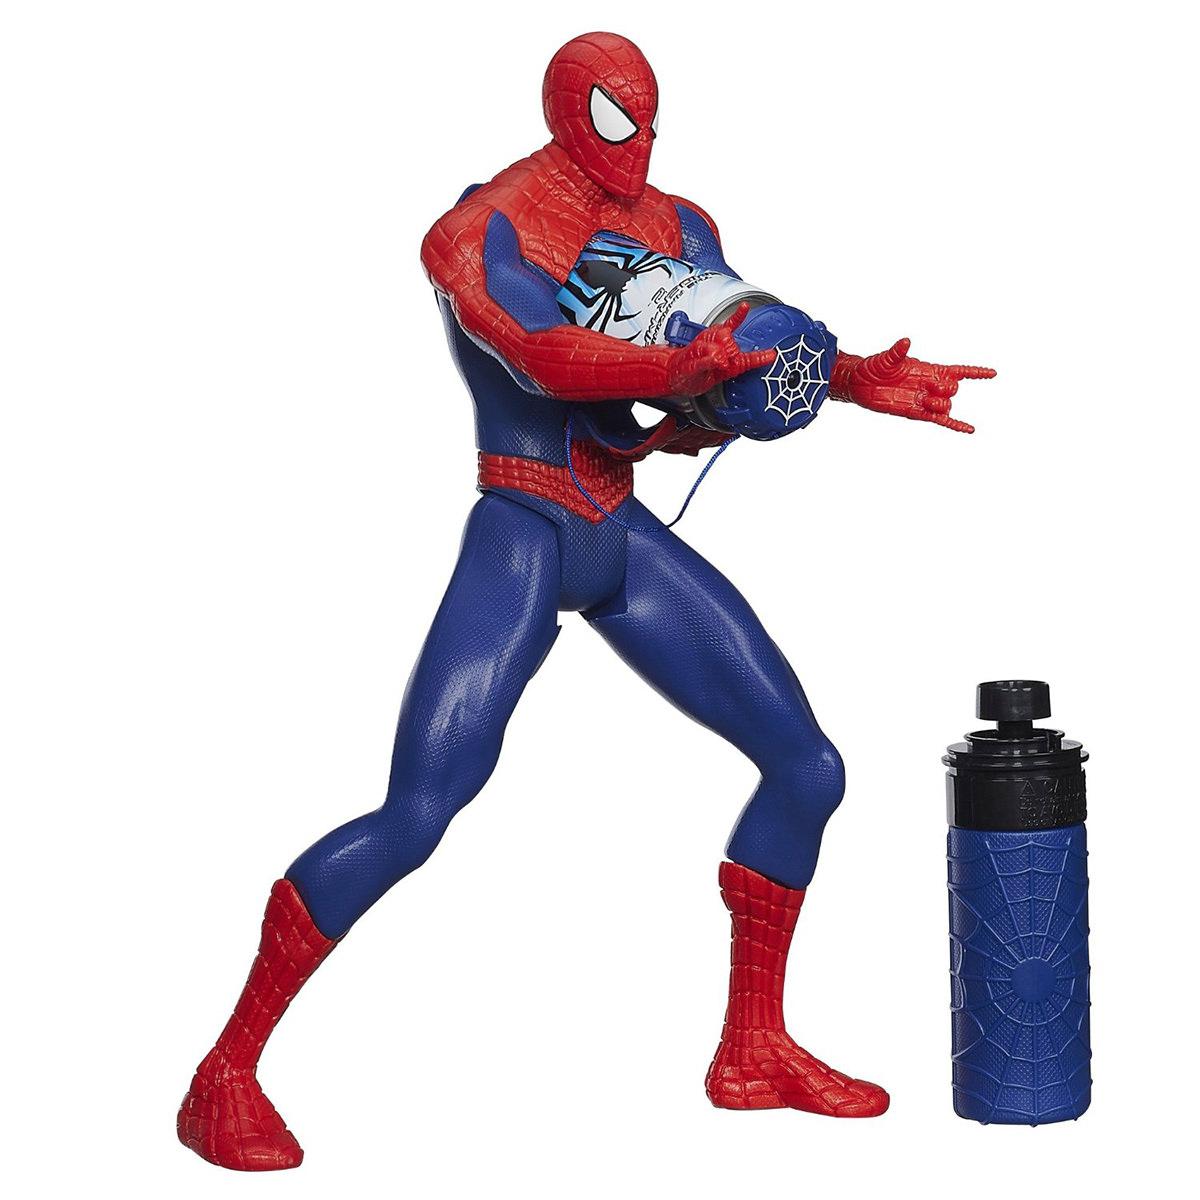 Hasbro A6997 Marvel Web Slinging Spiderman Figure At Hobby